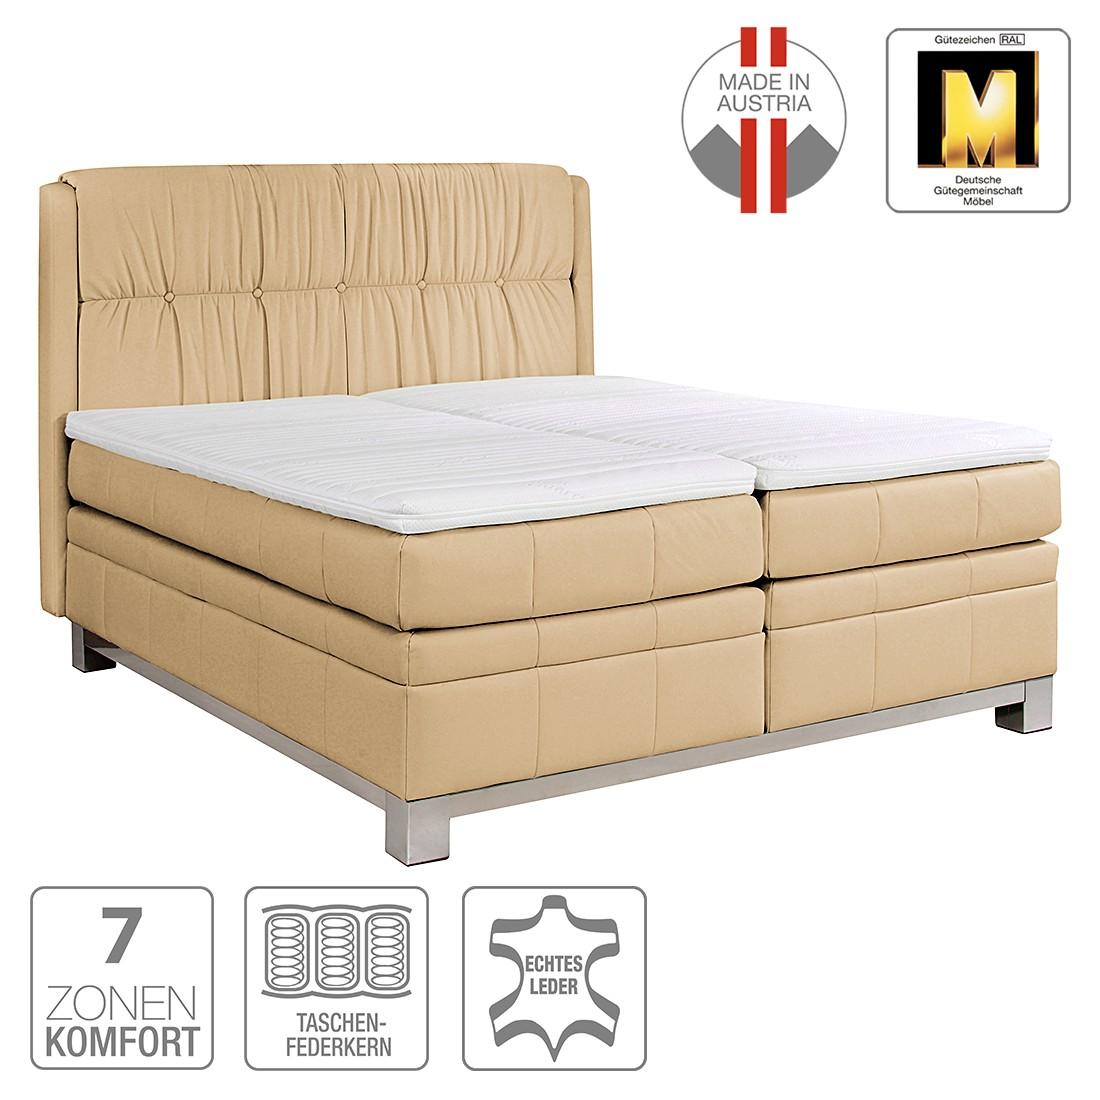 boxspringbett wolke7 ii echtleder 180 x 200cm h2 bis 80 kg hellbraun ada premium jetzt. Black Bedroom Furniture Sets. Home Design Ideas